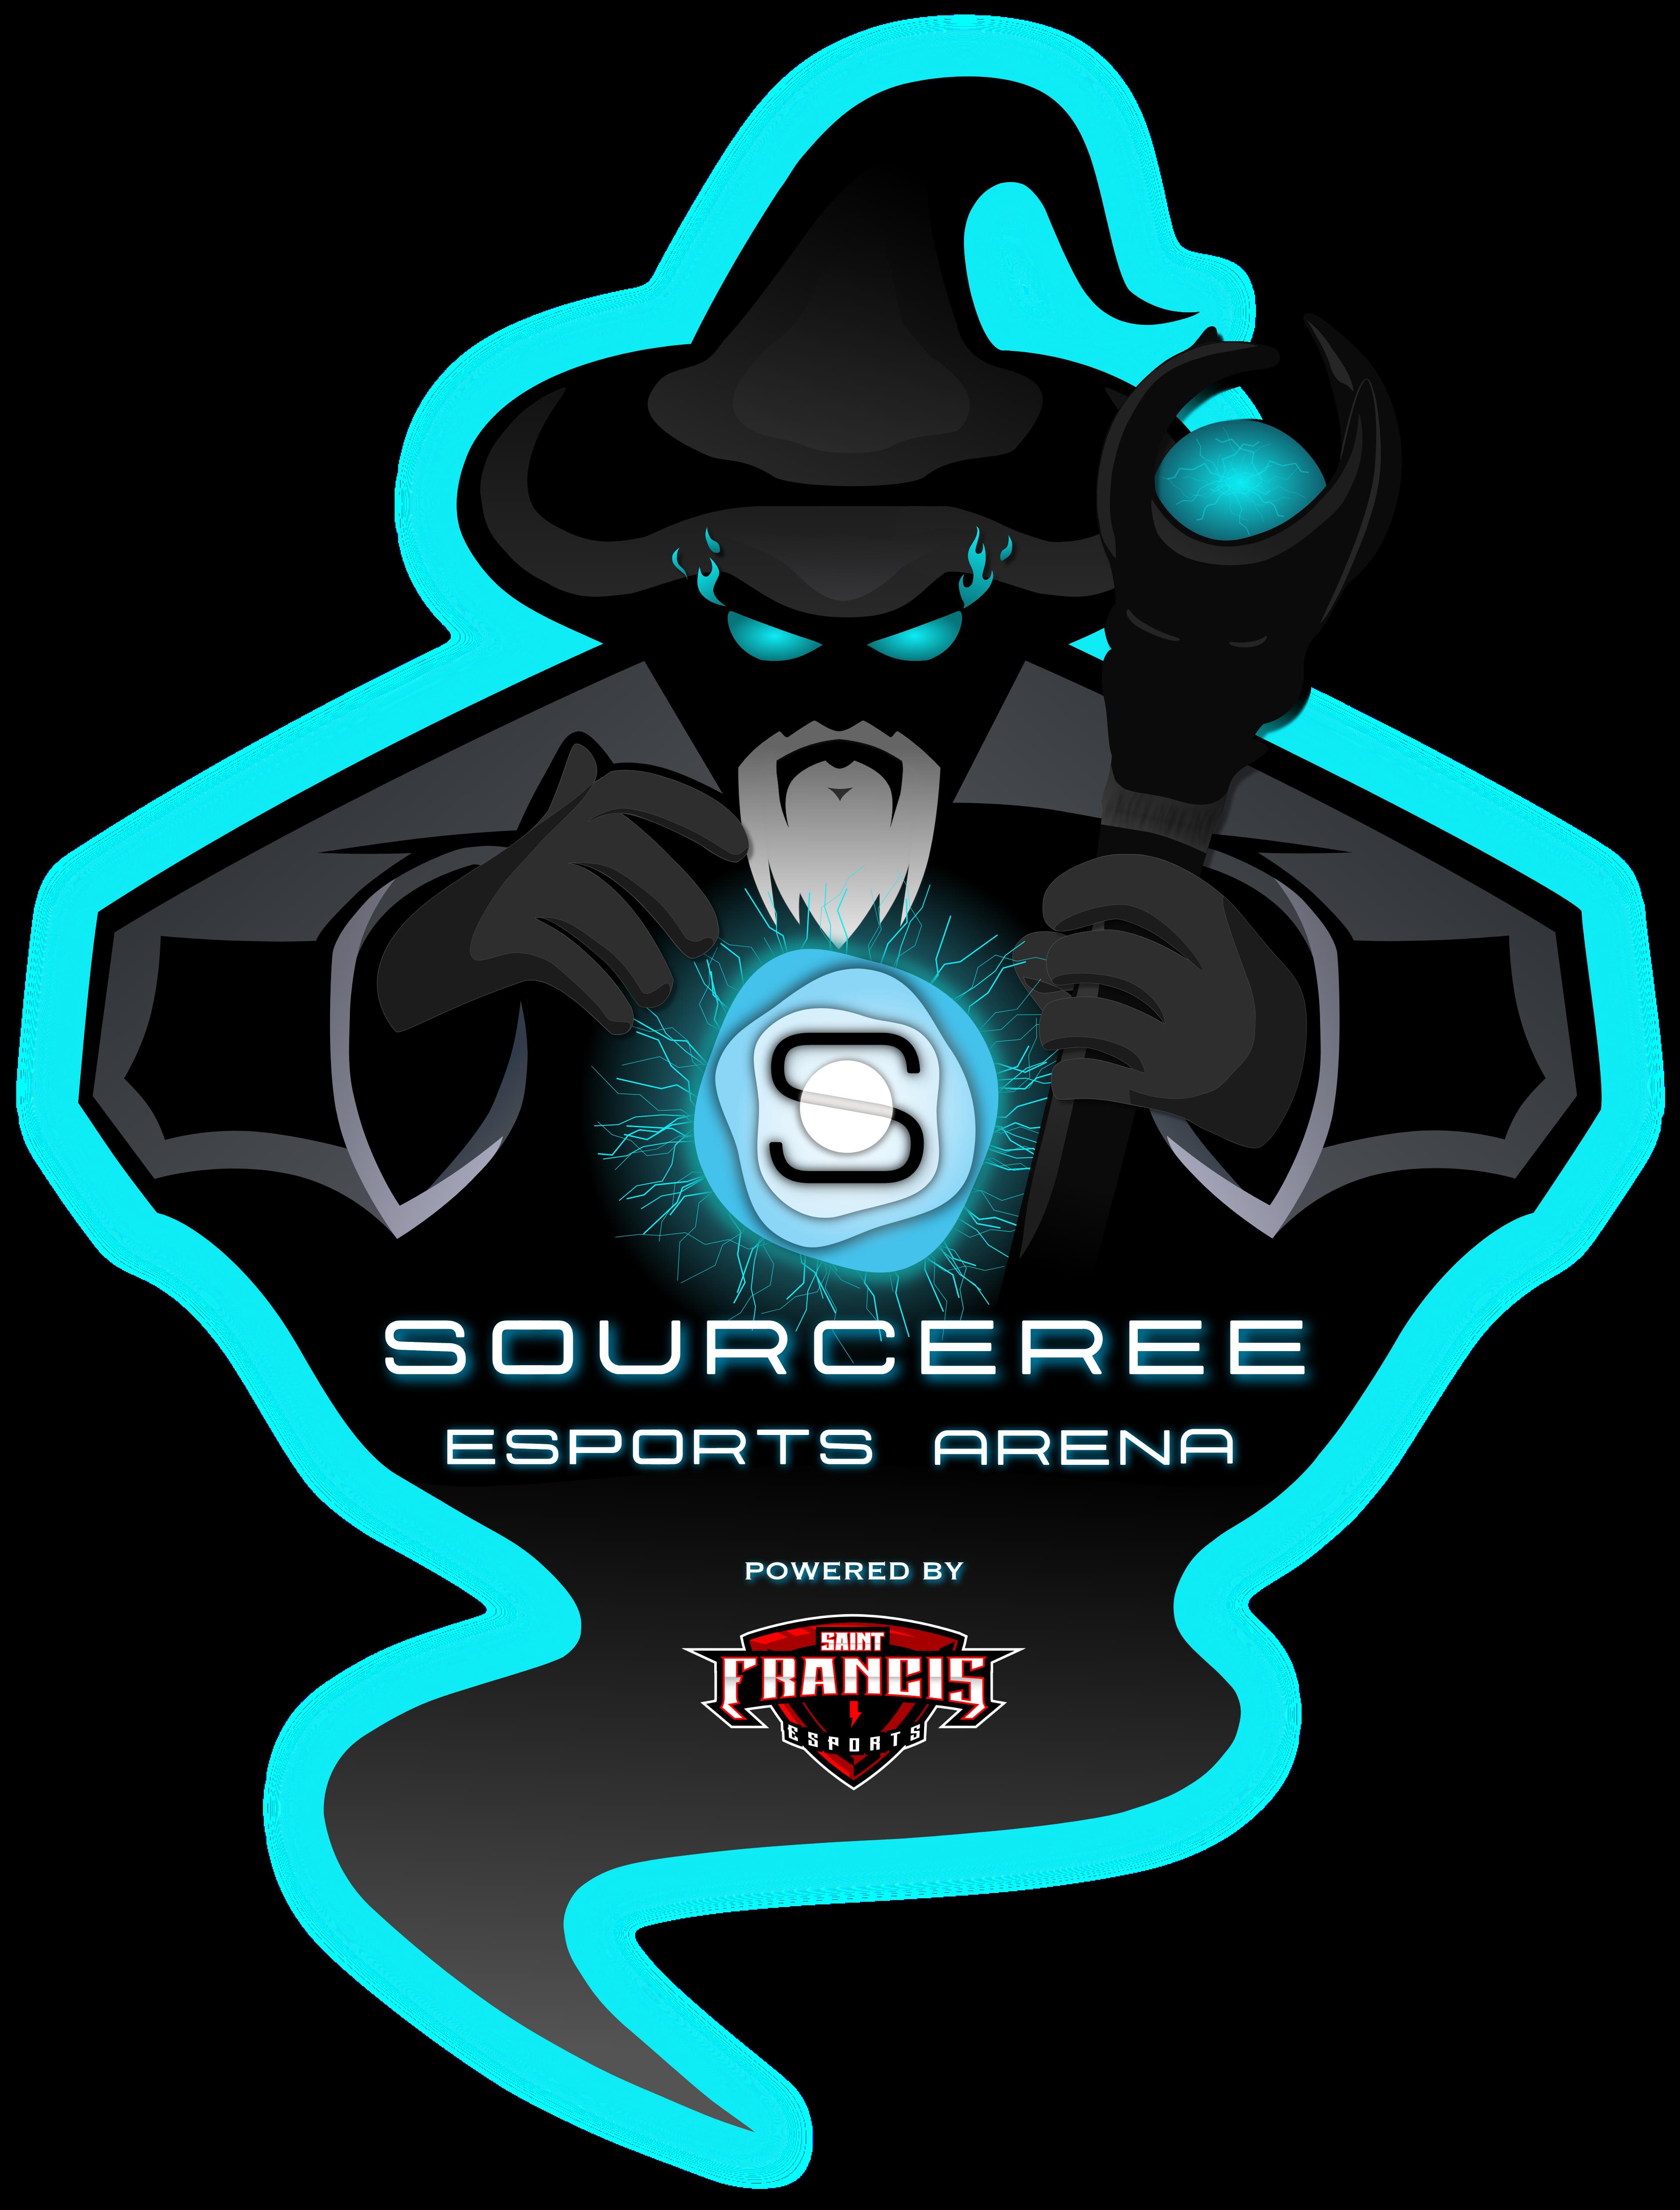 Sourceree